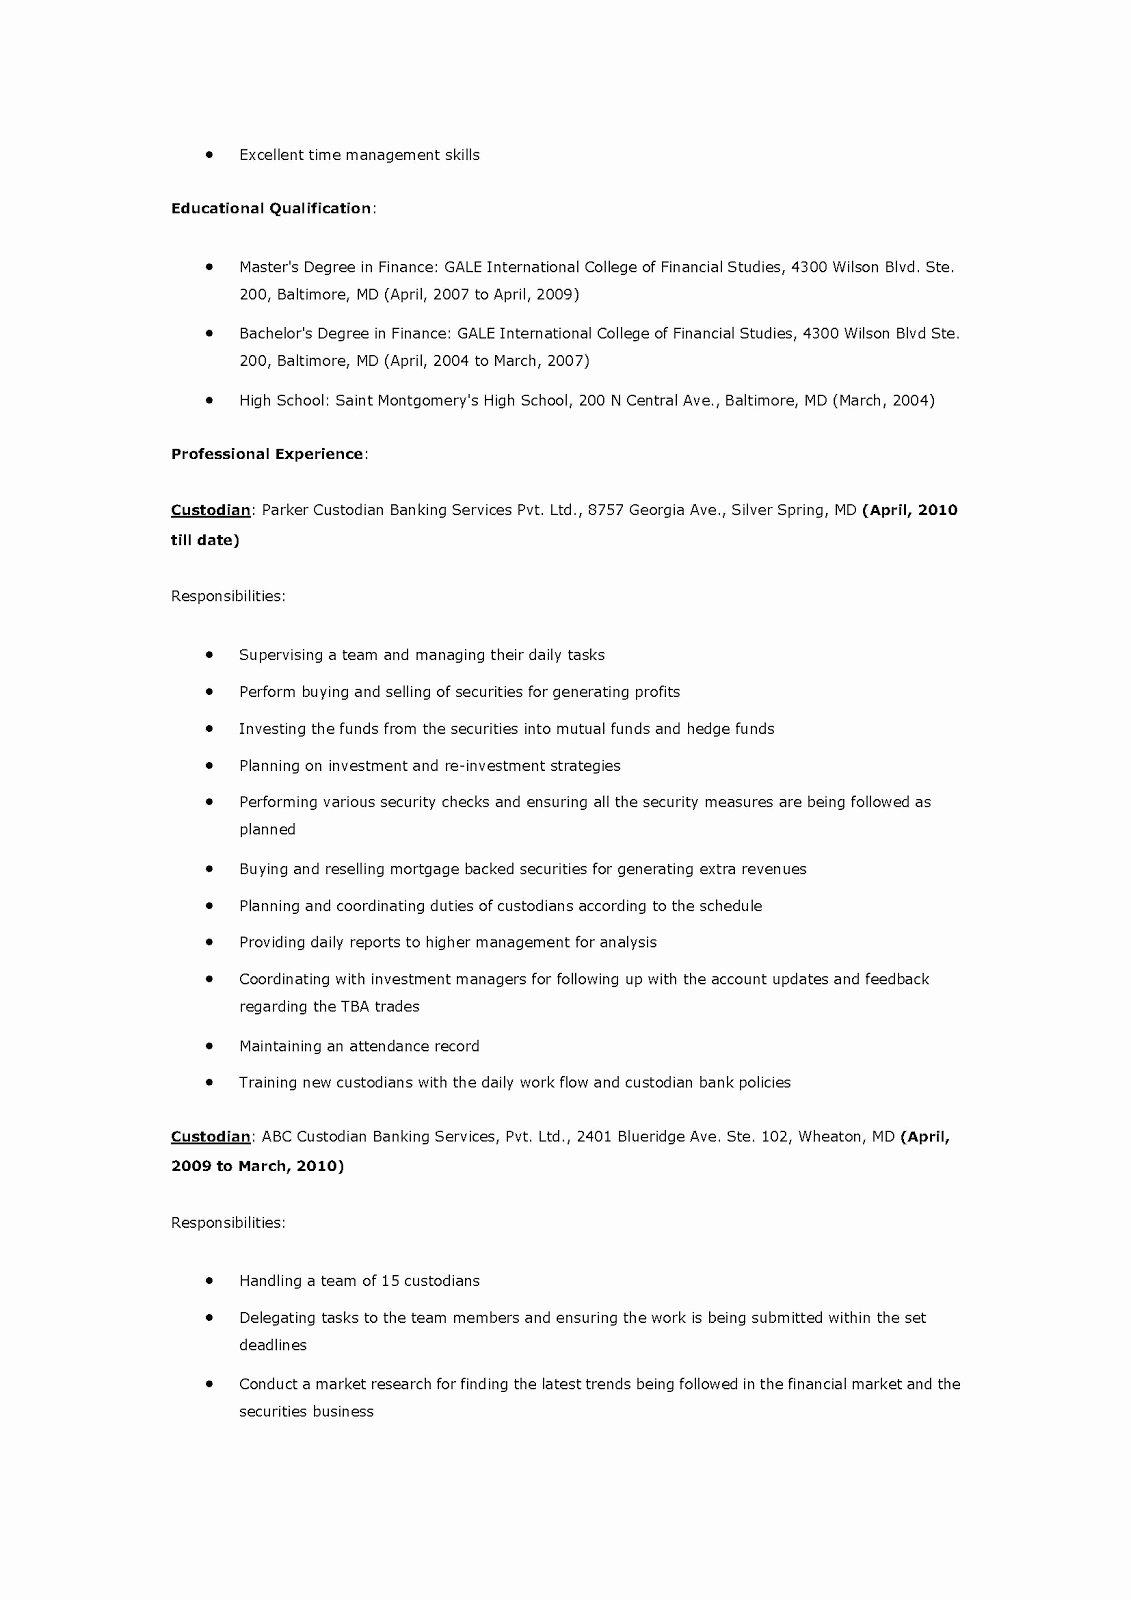 Custodian Job Description for Resume – Perfect Resume format